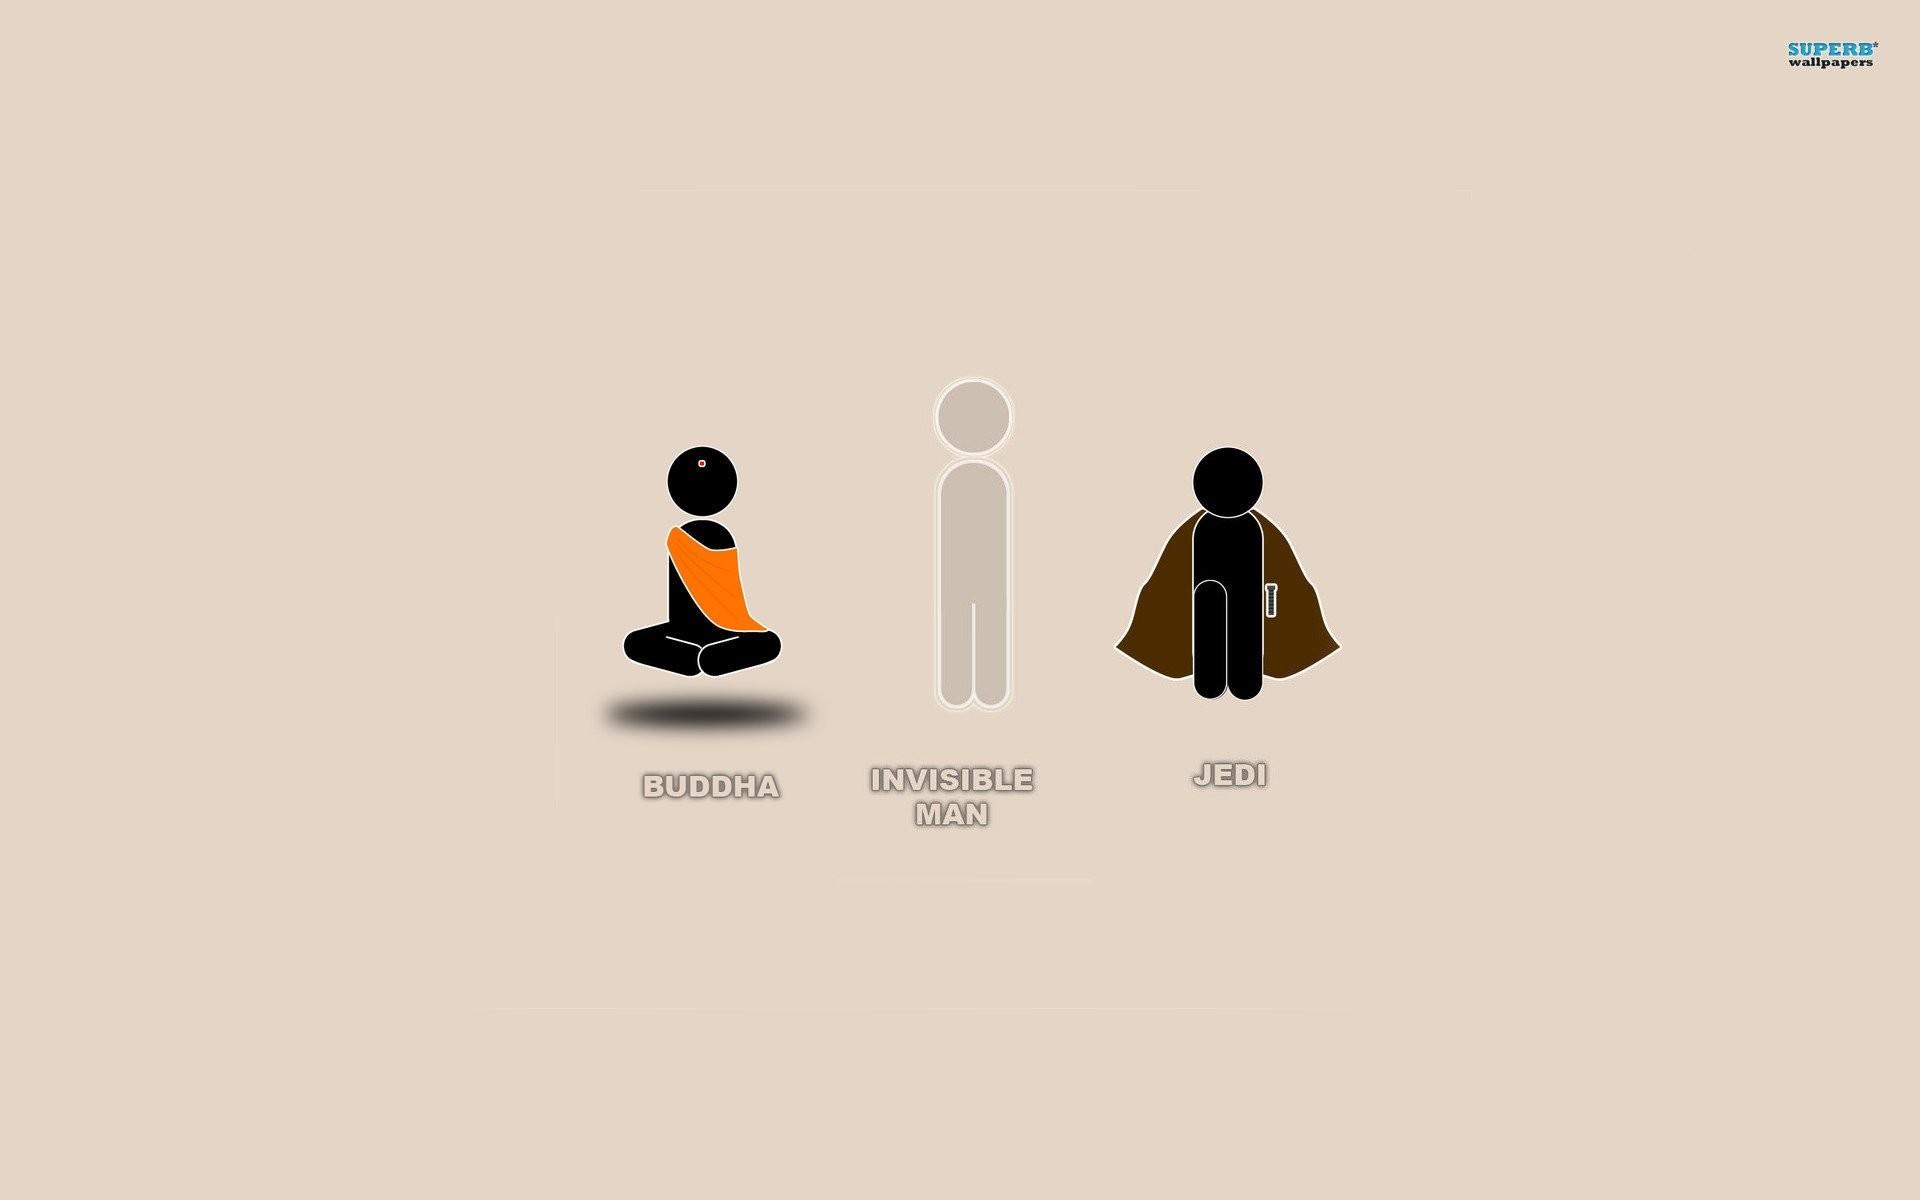 … desktop and; buddha invisible man and jedi 444373 walldevil …